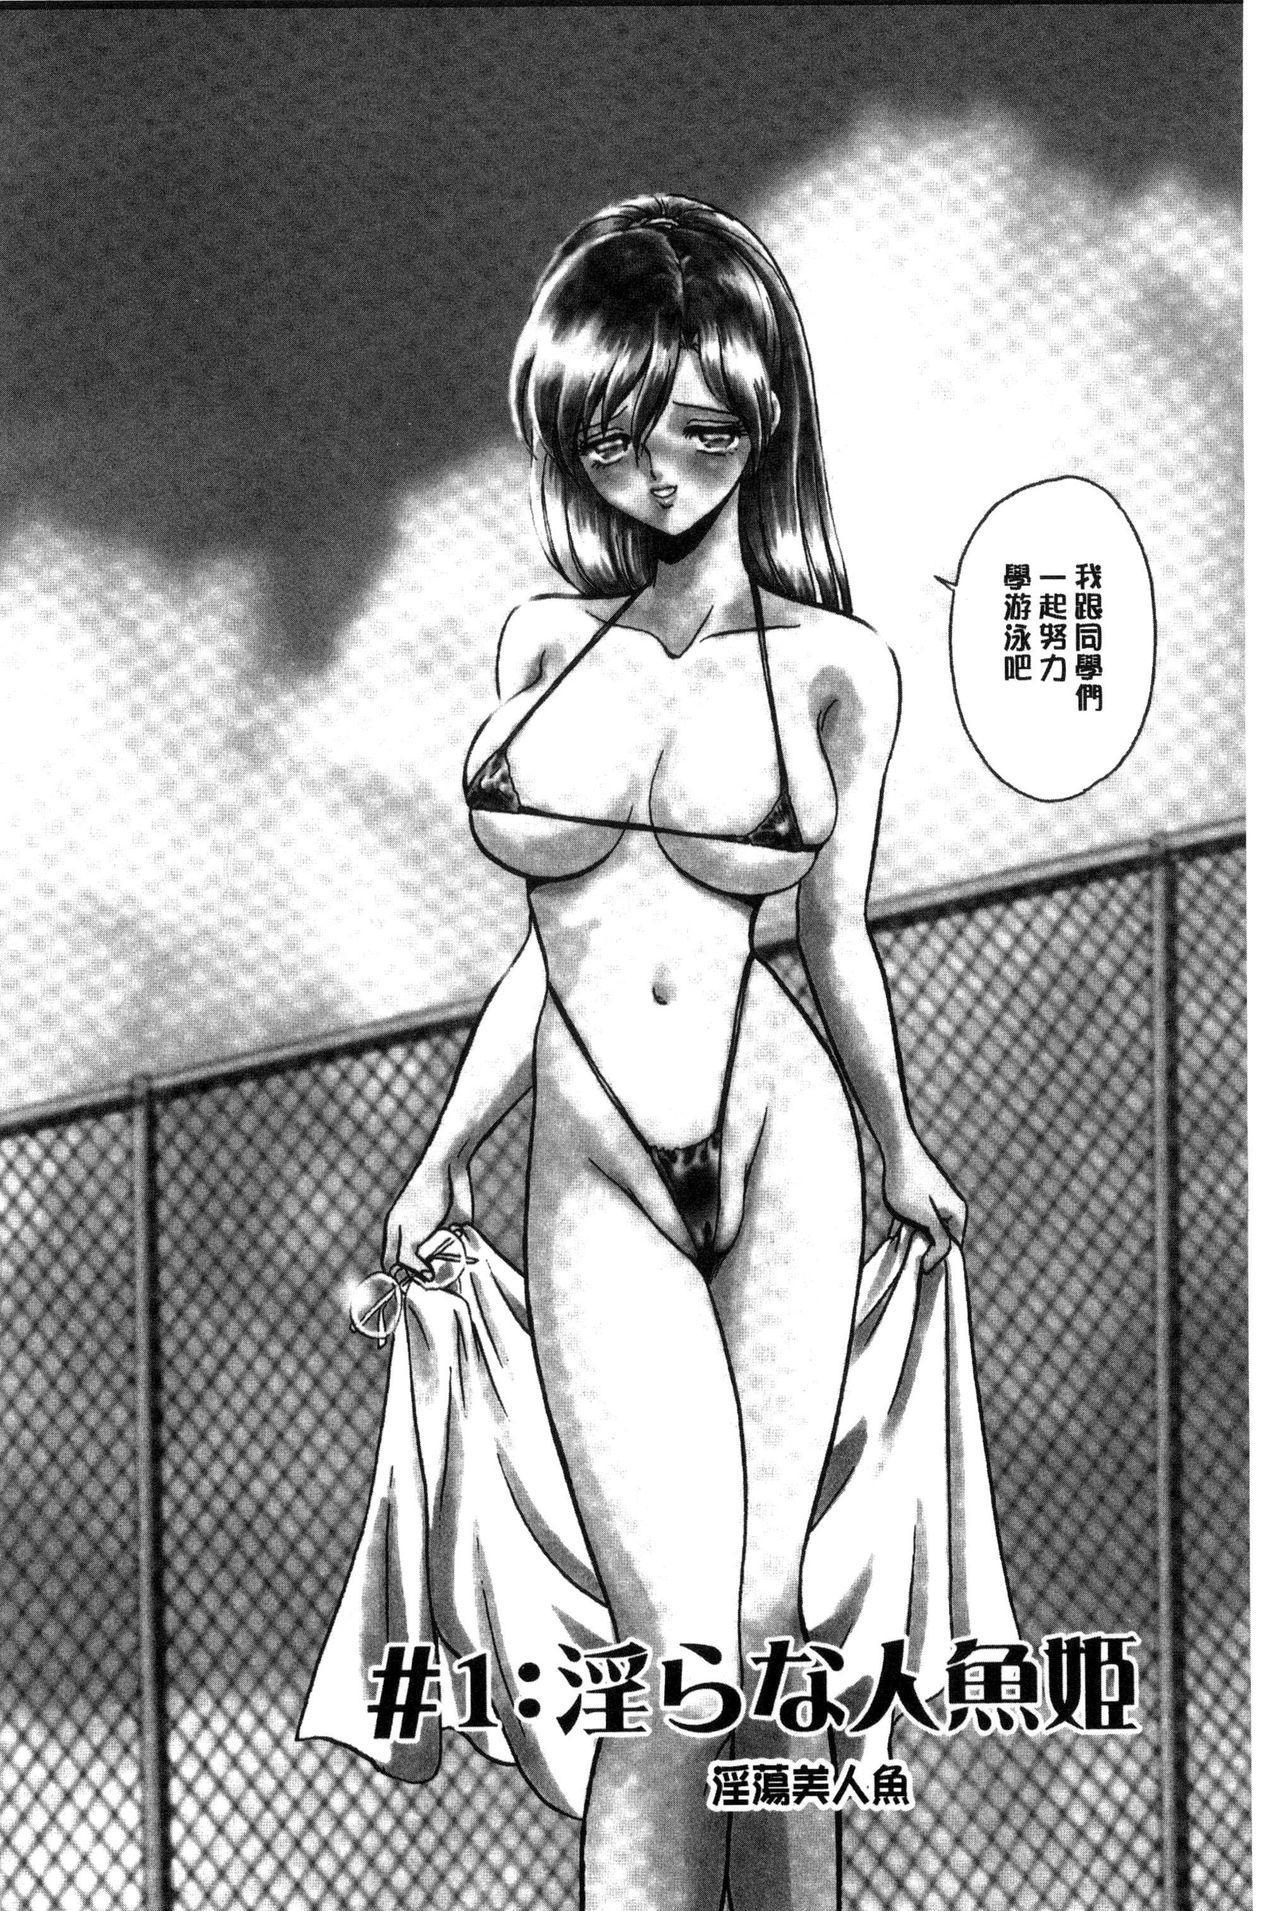 Hazukashii Kagai Jugyou | 害羞的課外授業 22